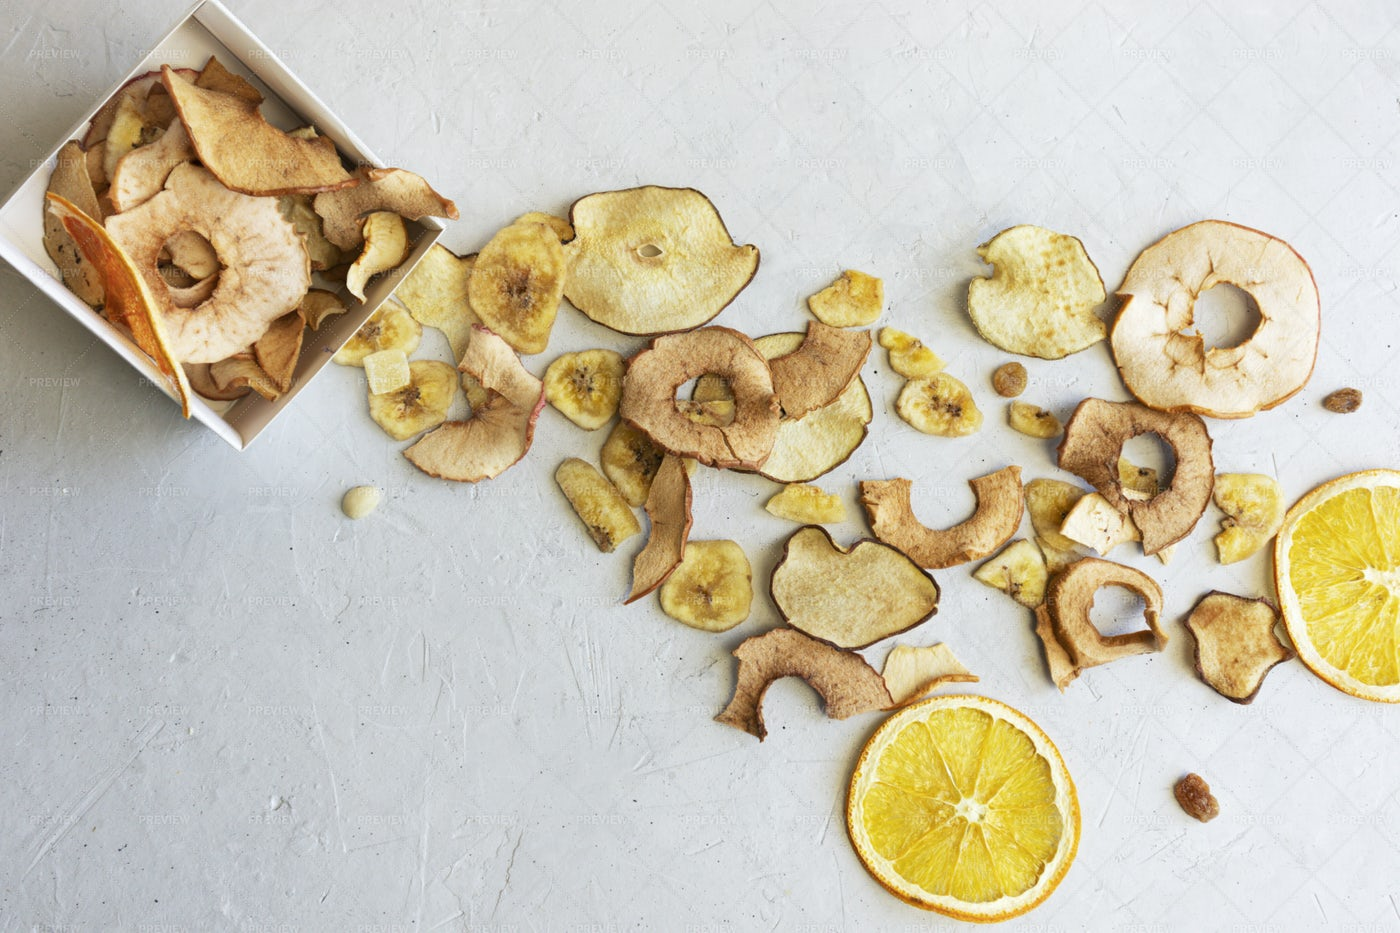 Fruit Chips: Stock Photos